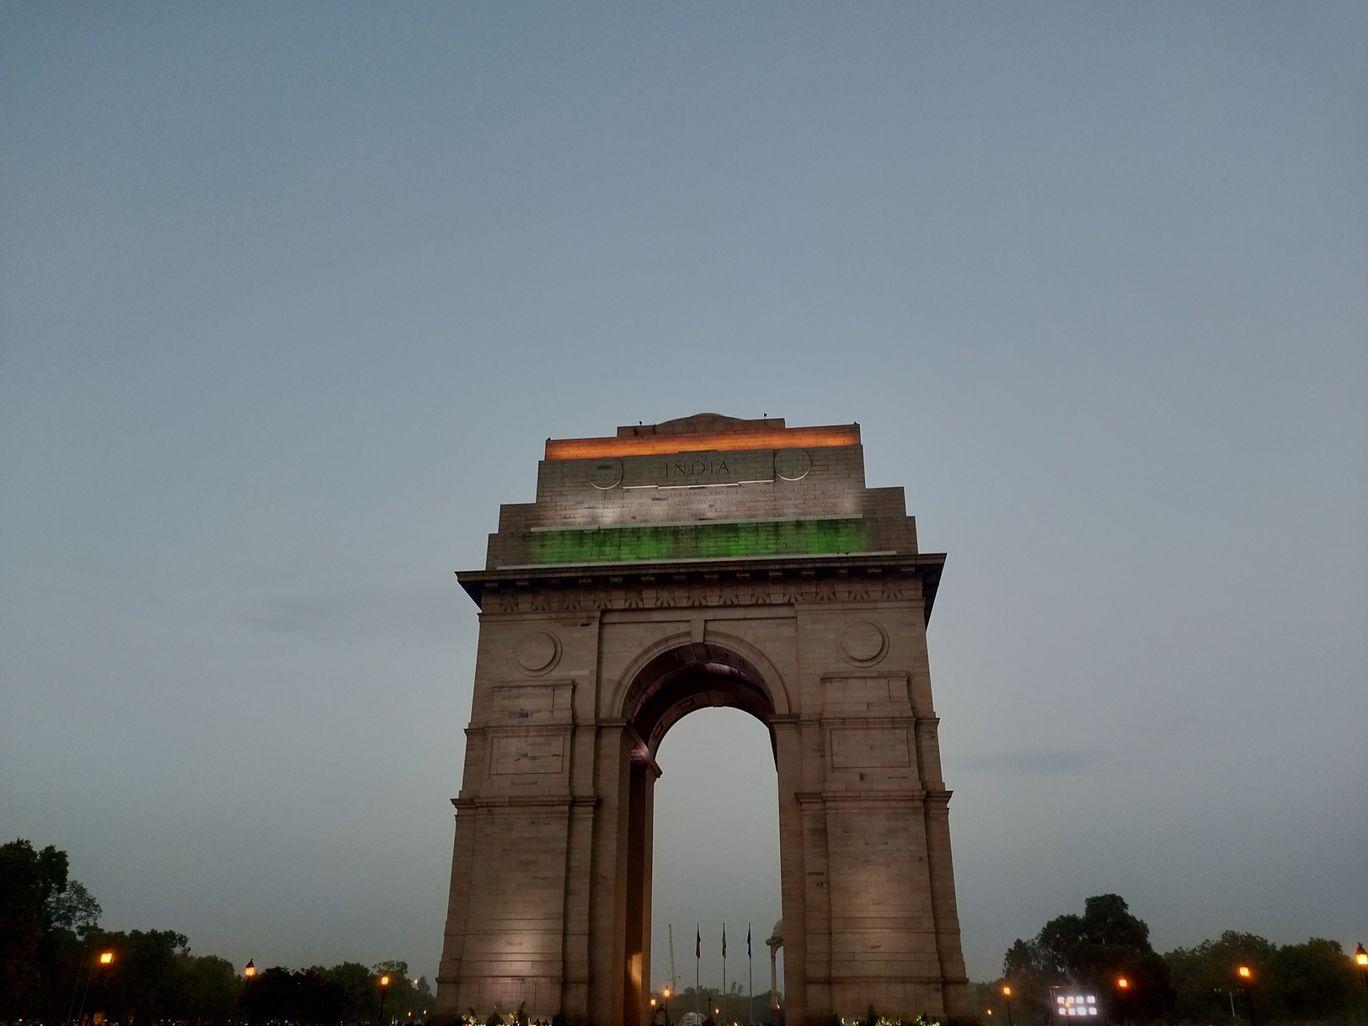 Photo of India Gate By Ashik Salam